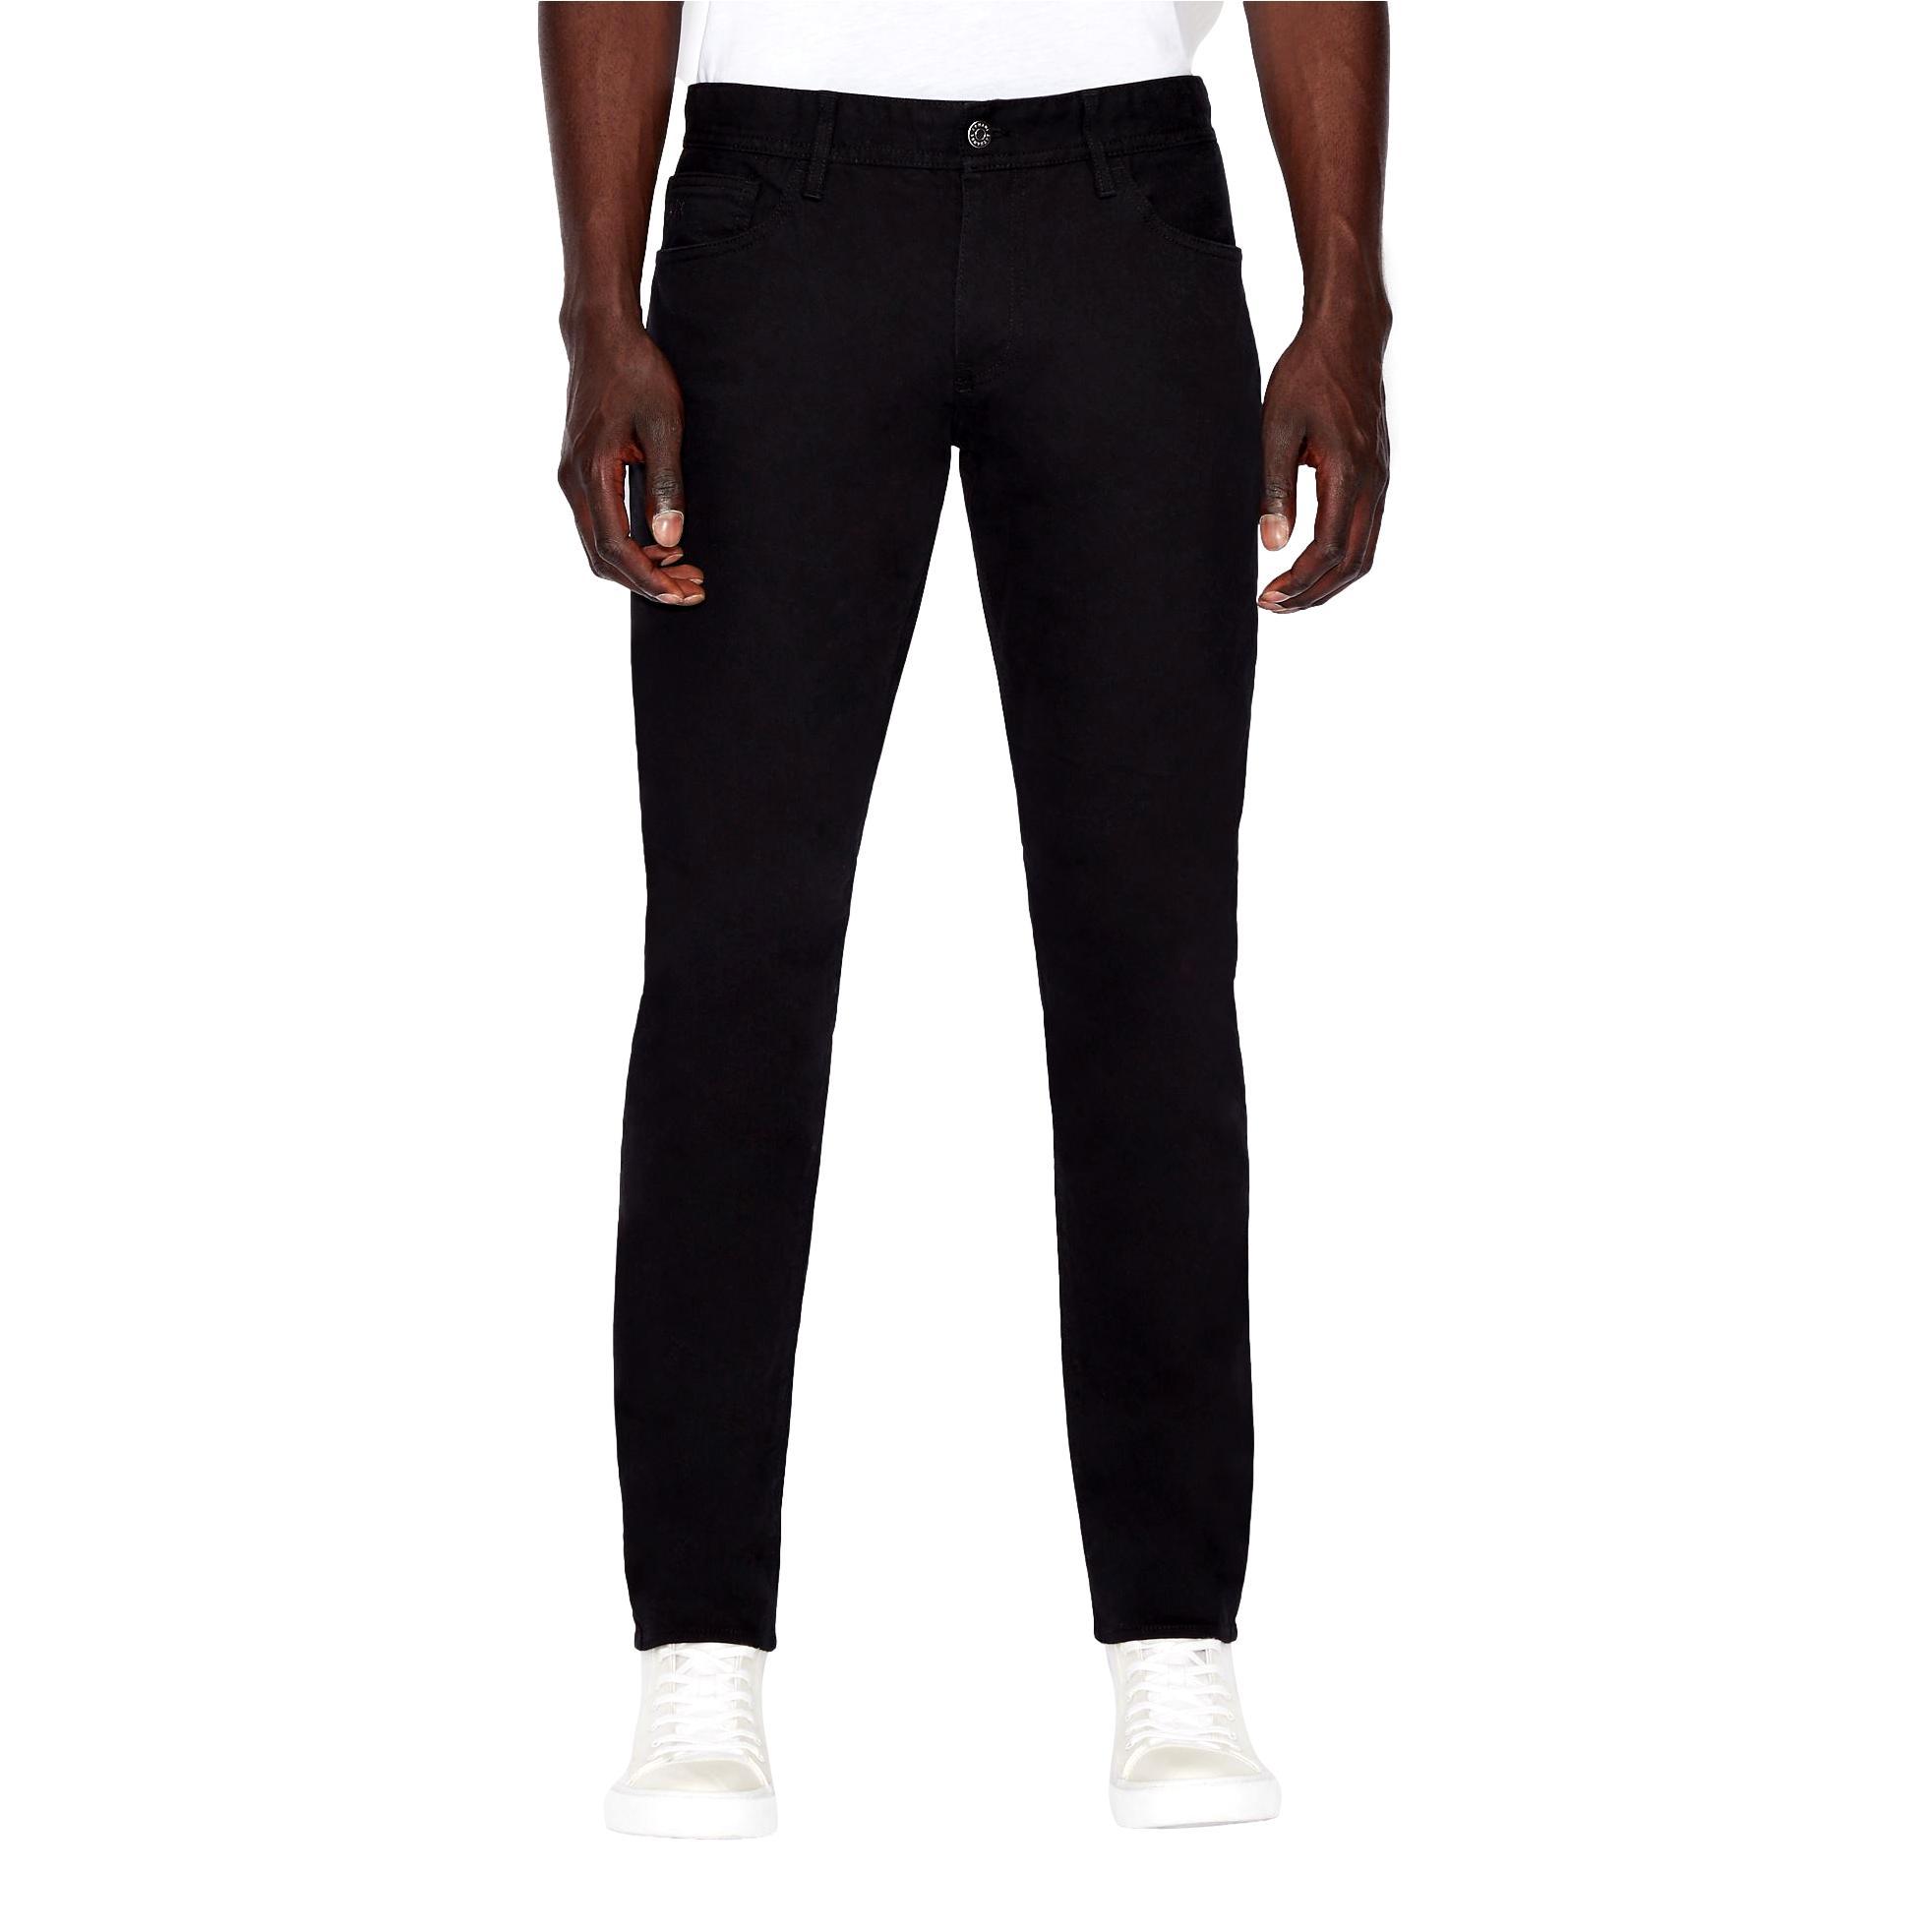 Jeans slim fit ARMANI EXCHANGE |  | 8NZJ14 Z1SBZ1200